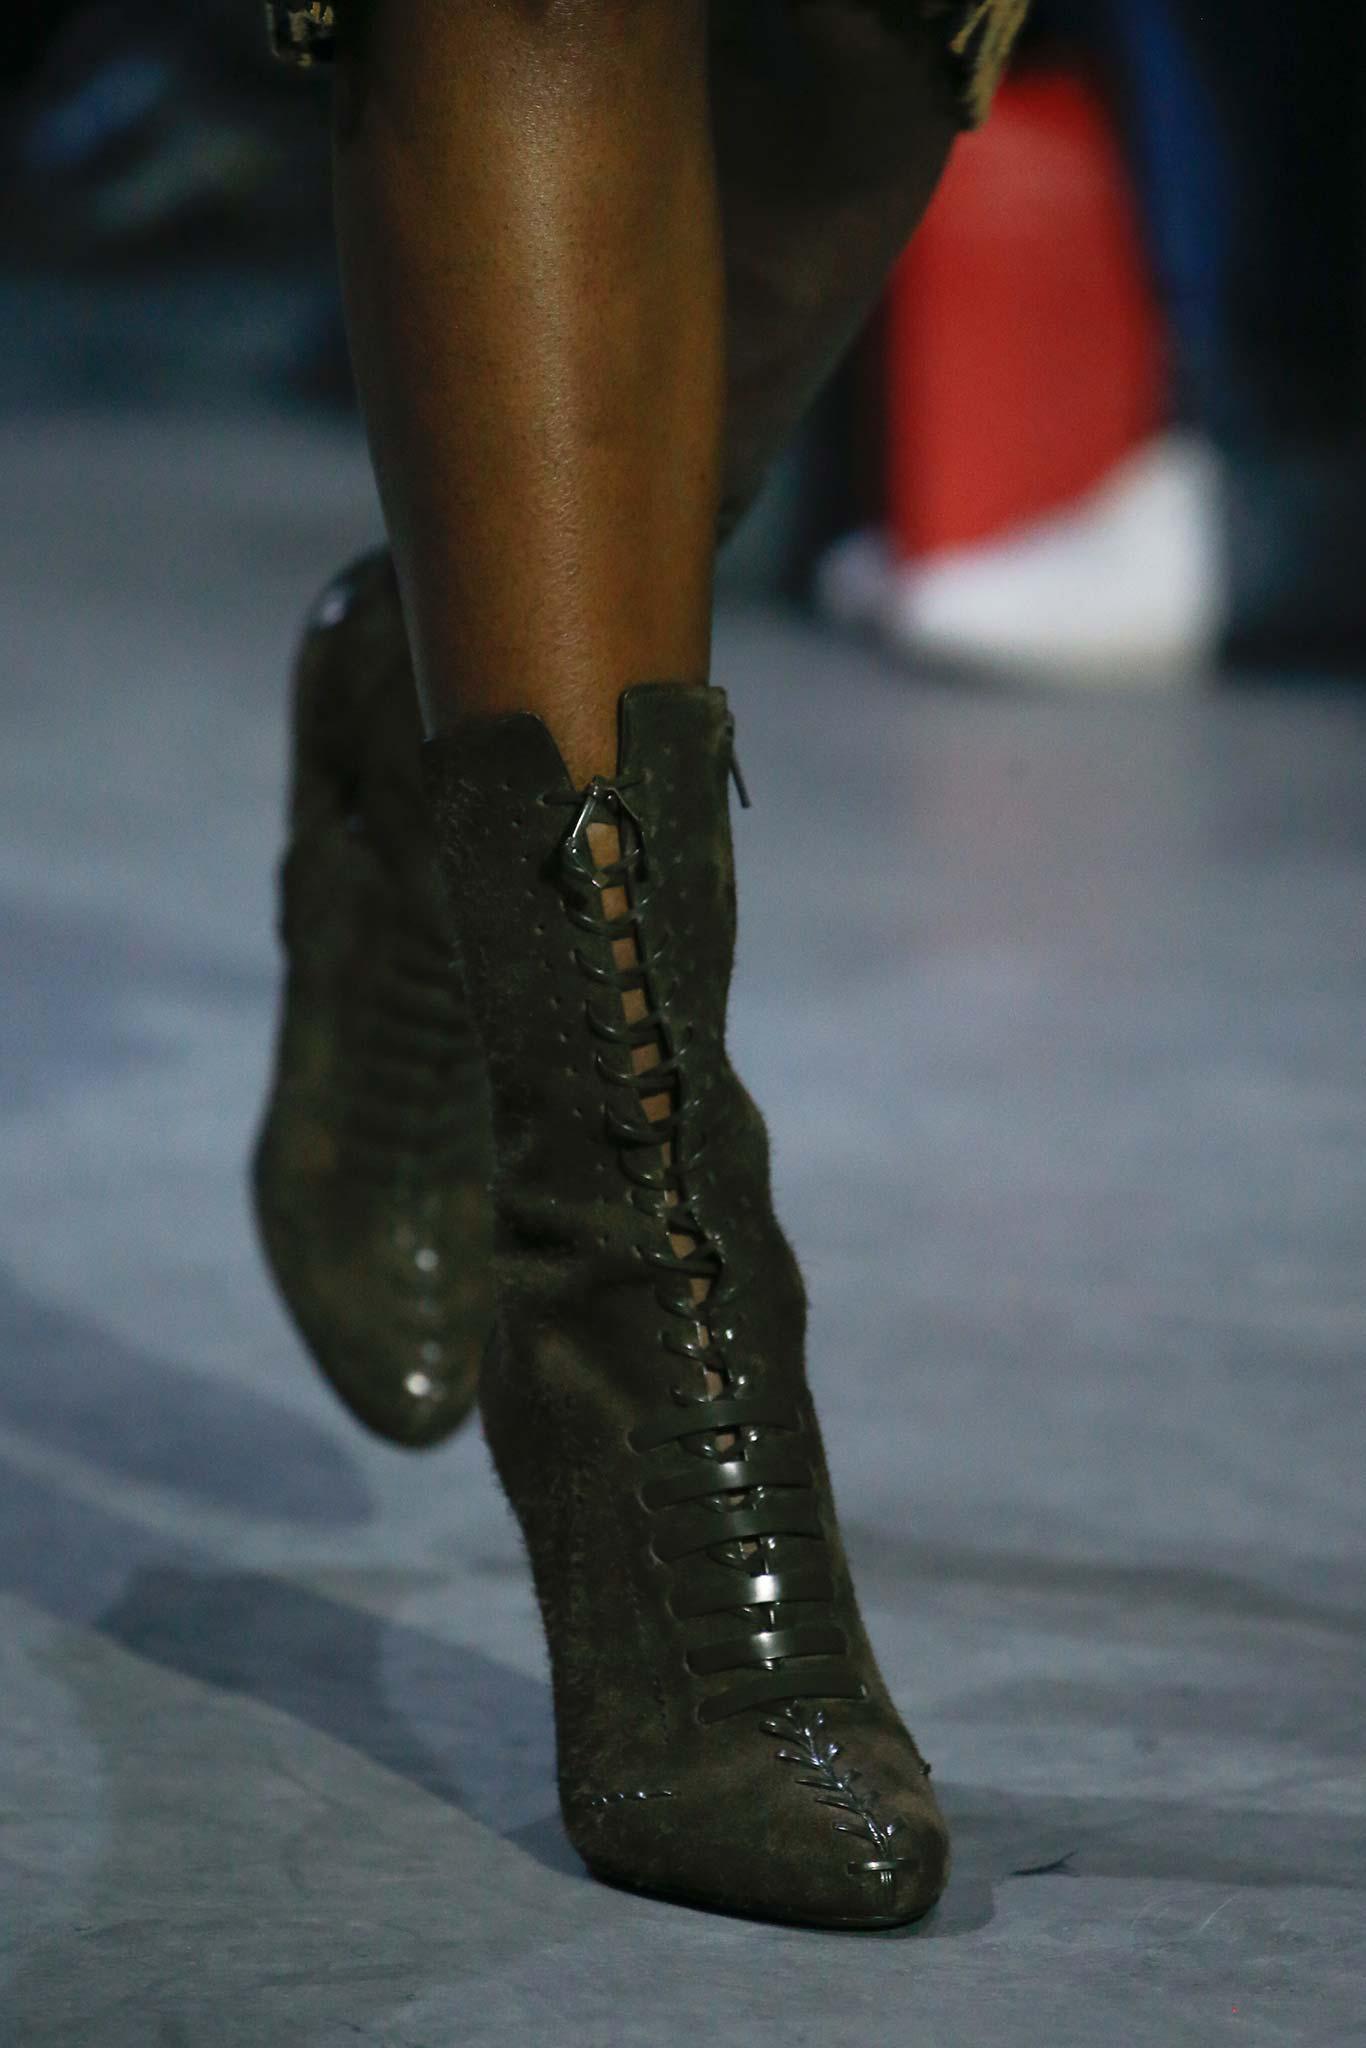 32-3-1-phillip-lim-boots.jpg